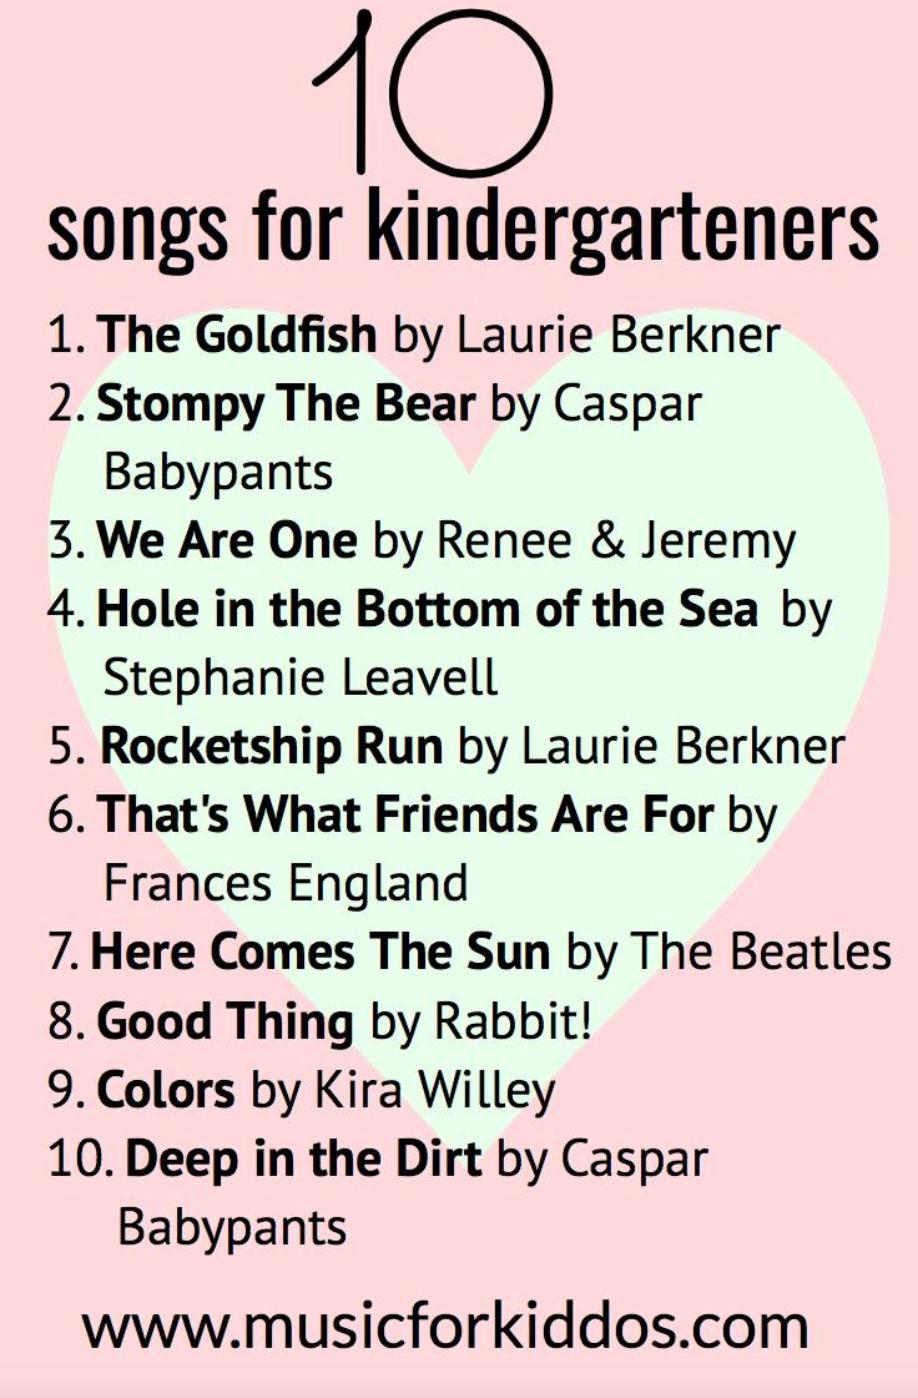 10 songs for kindergarteners